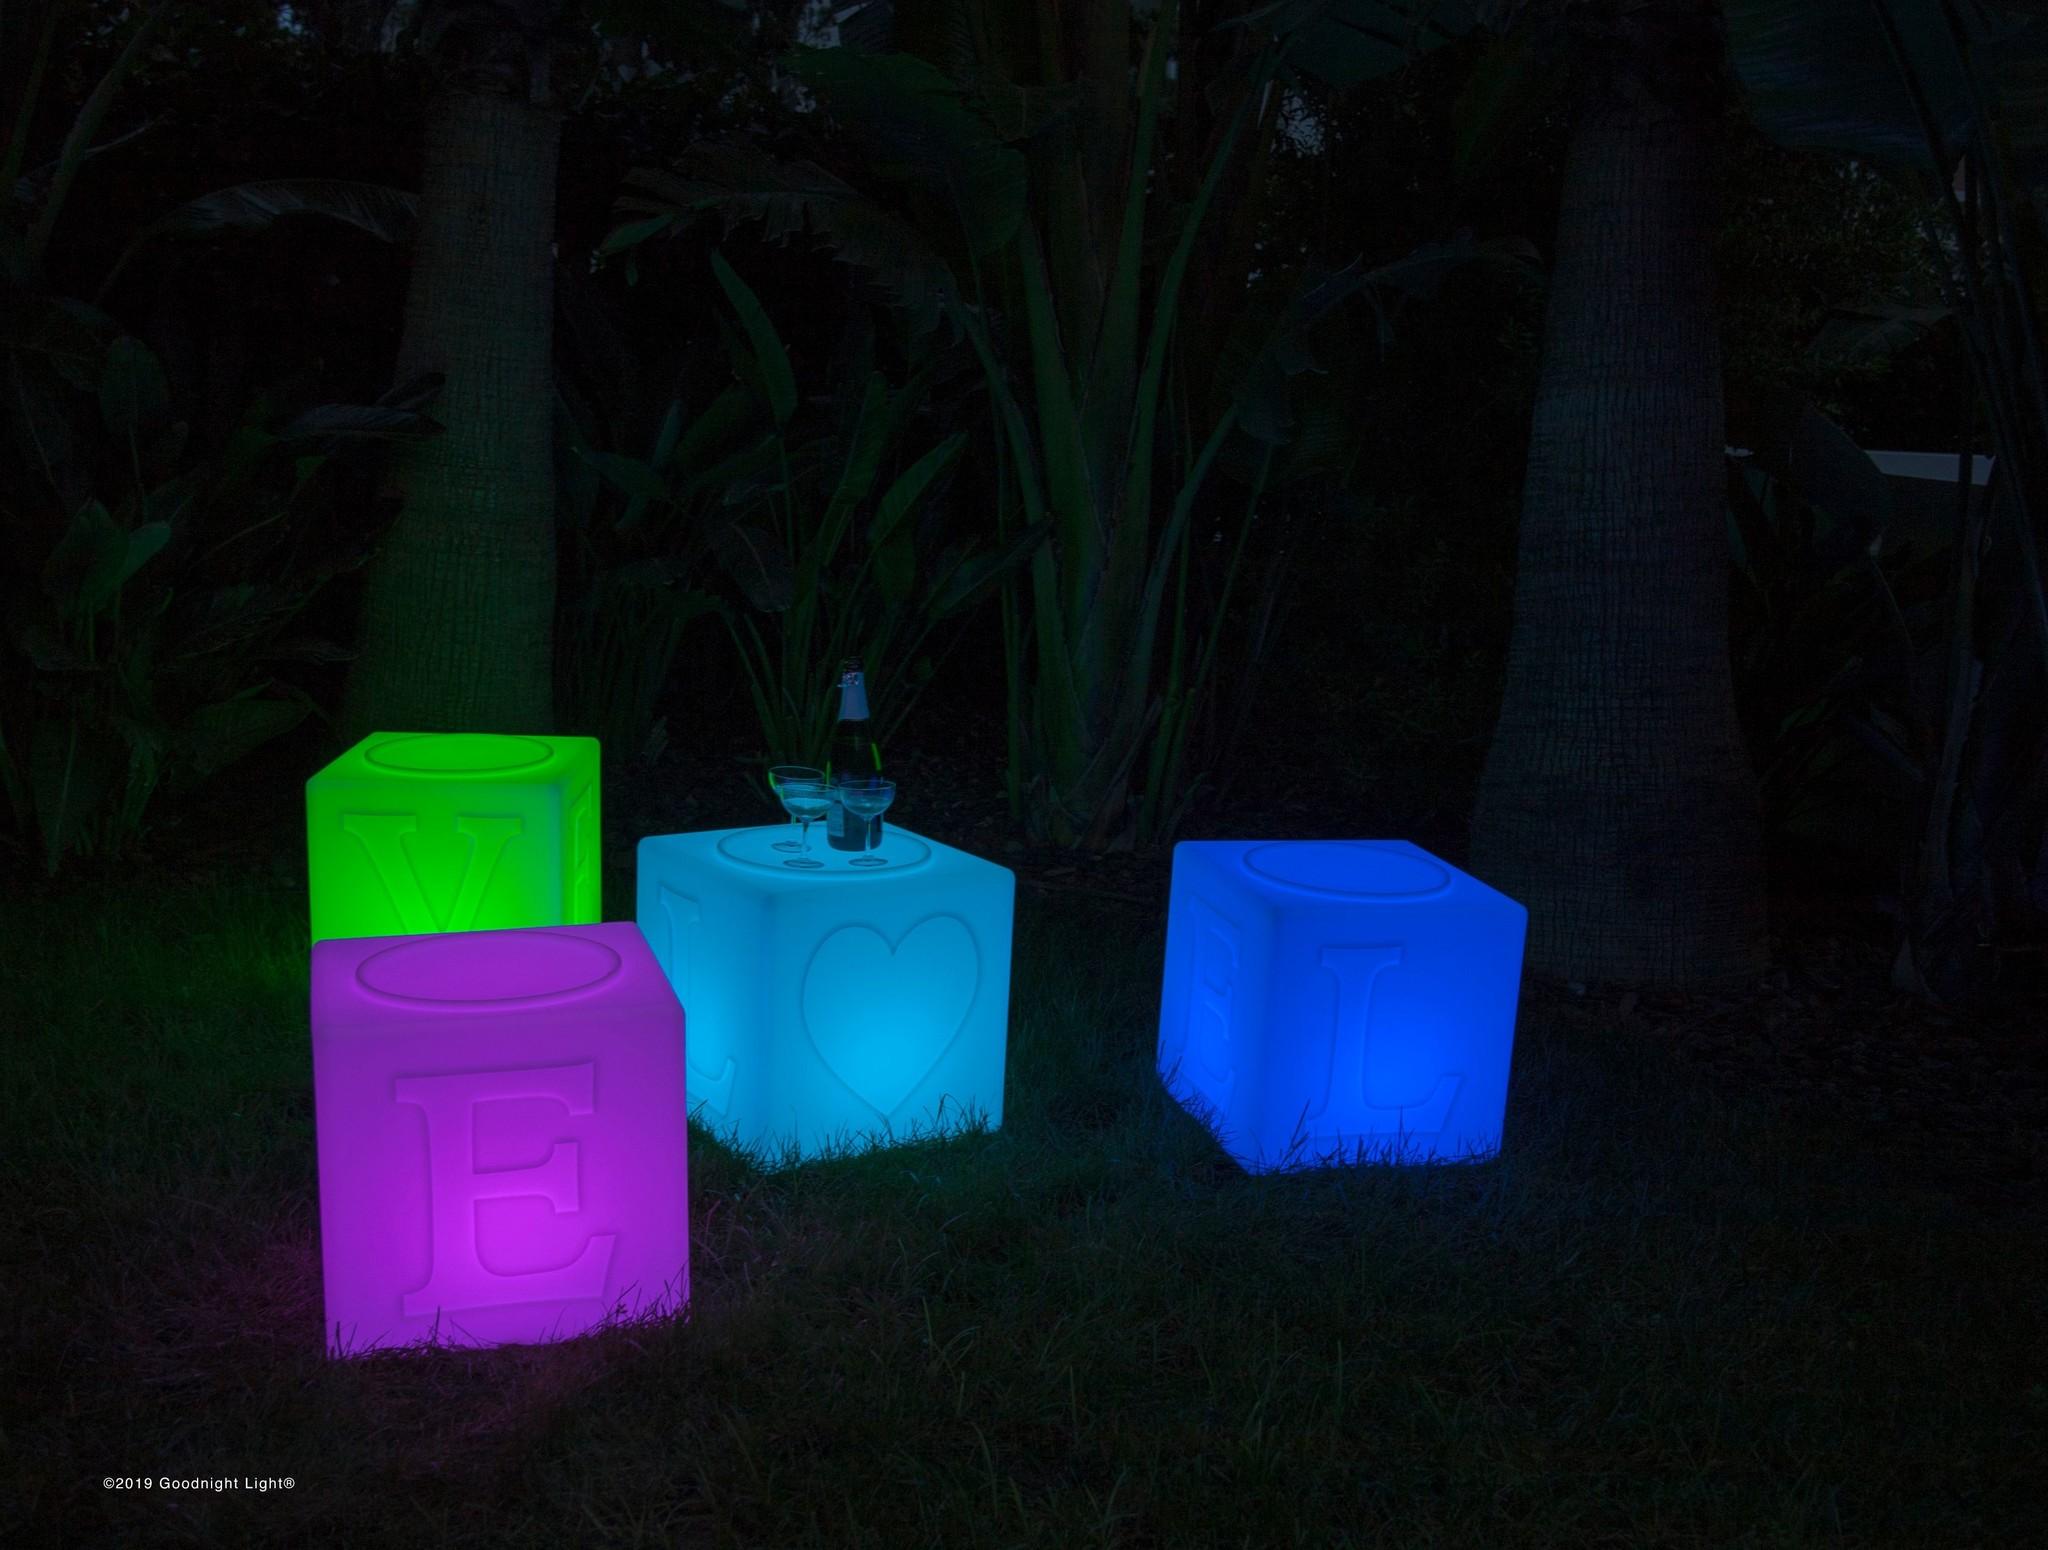 Goodnight Light® The LOVE lamp 43x43x43cm